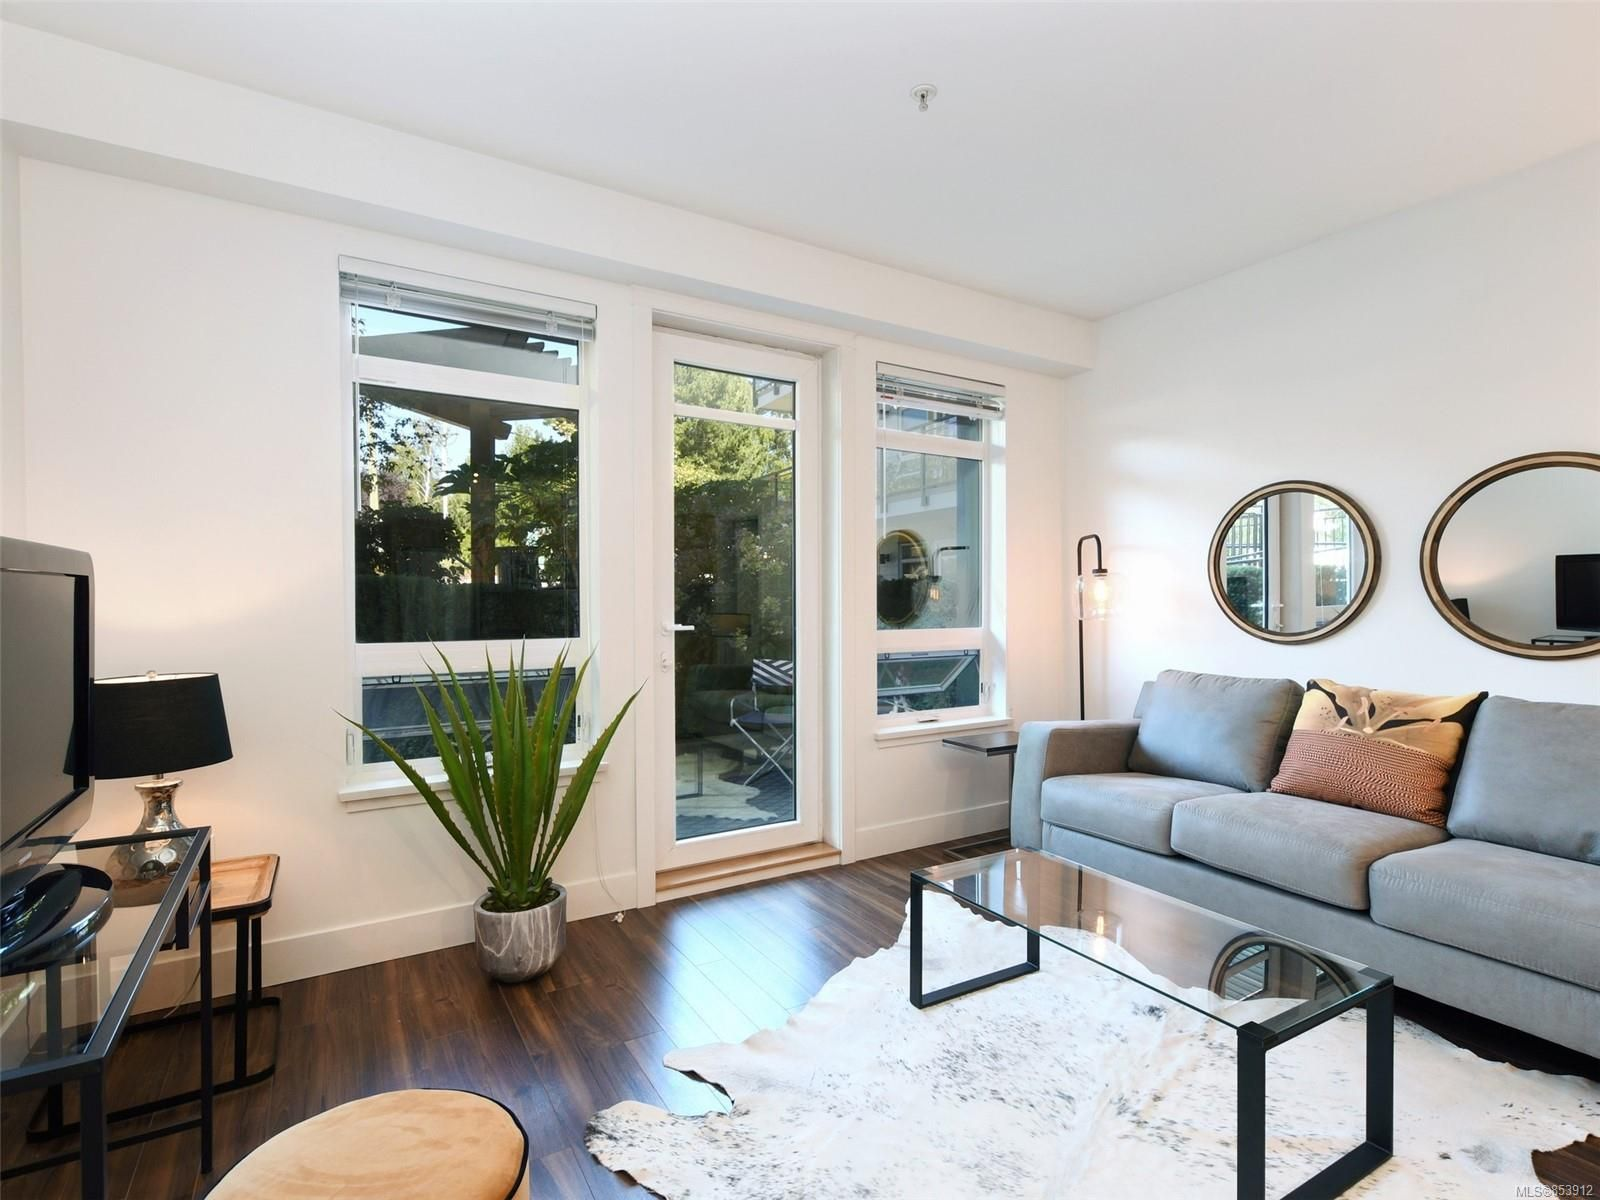 Main Photo: 107 935 Cloverdale Ave in : SE Quadra Condo for sale (Saanich East)  : MLS®# 853912